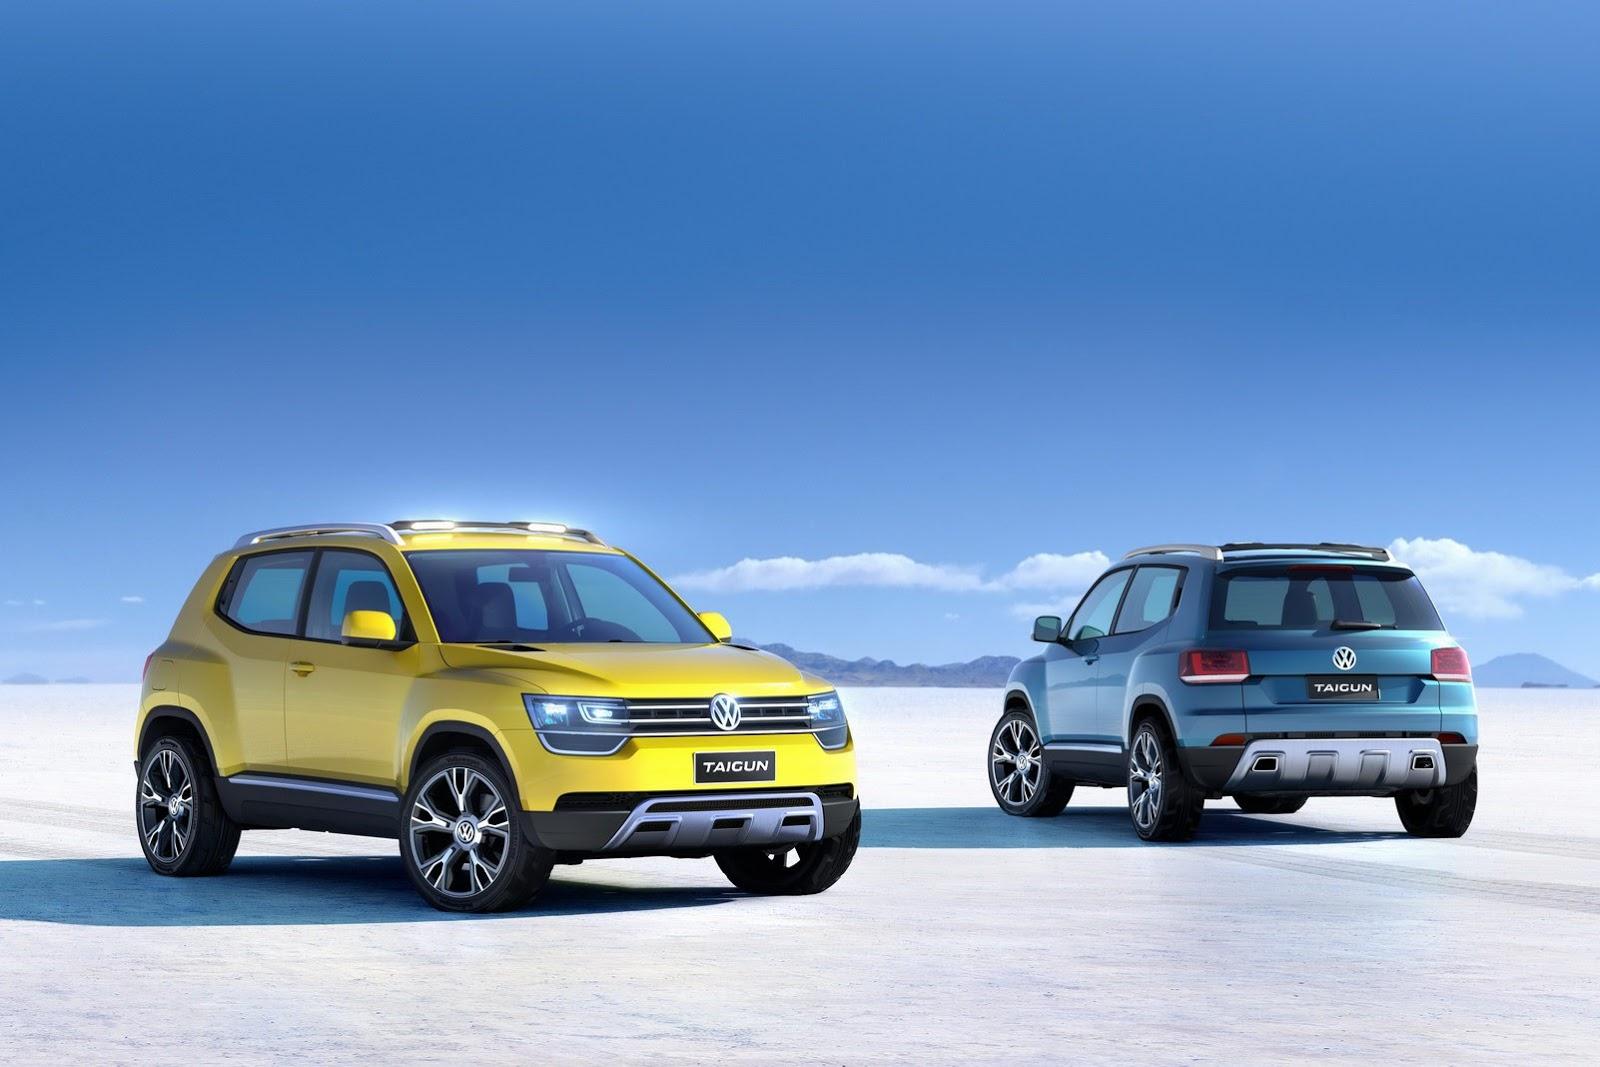 Volkswagen Taigun compact SUV for India